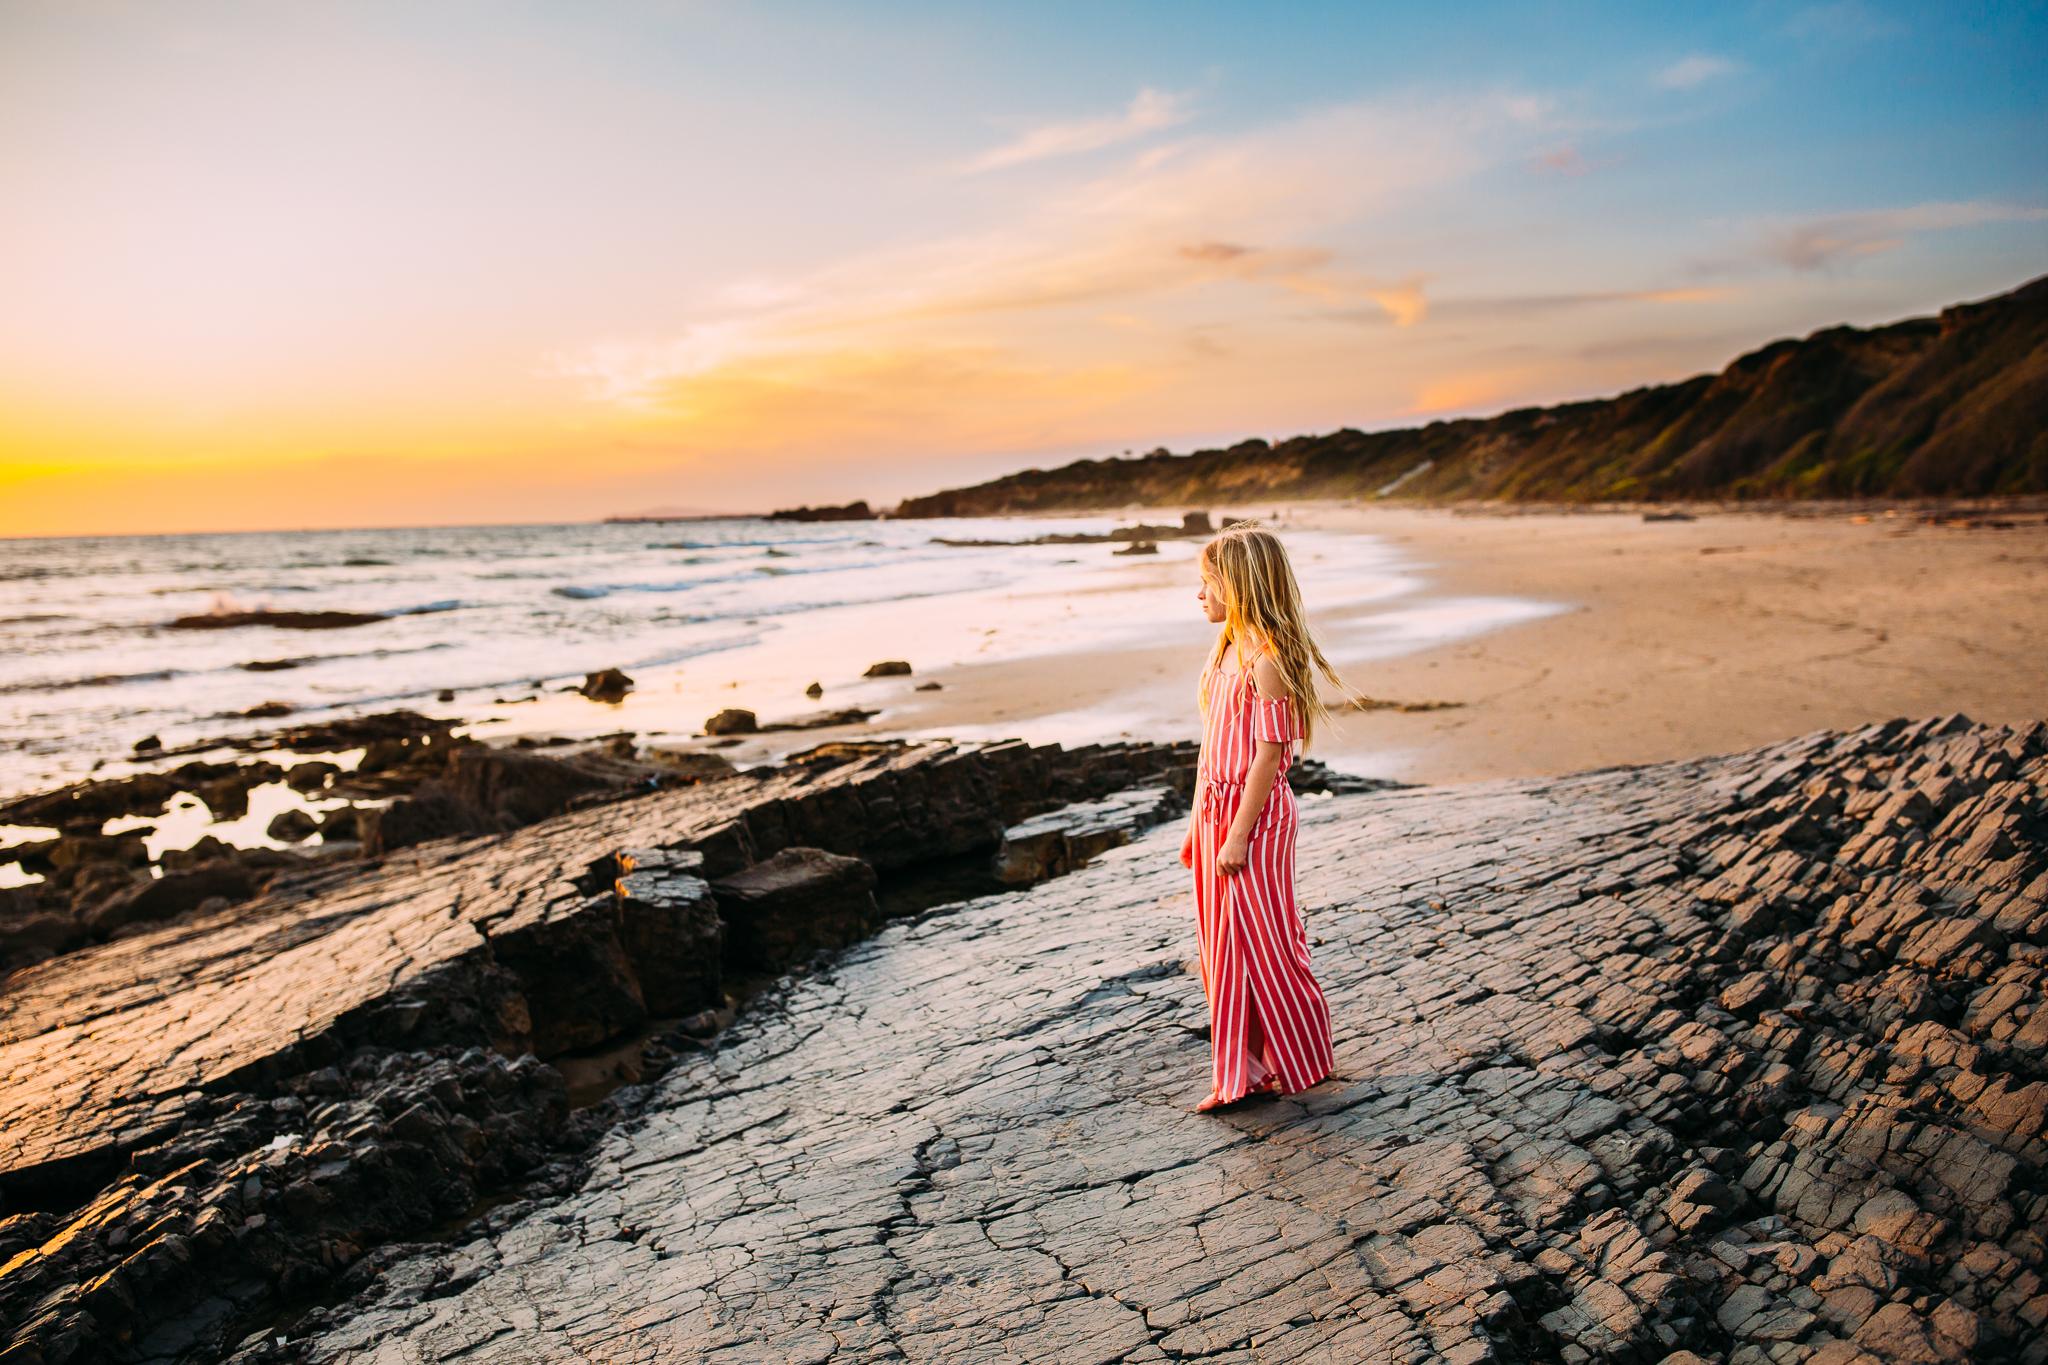 amily photo session at Newport Beach in Orange County, CA